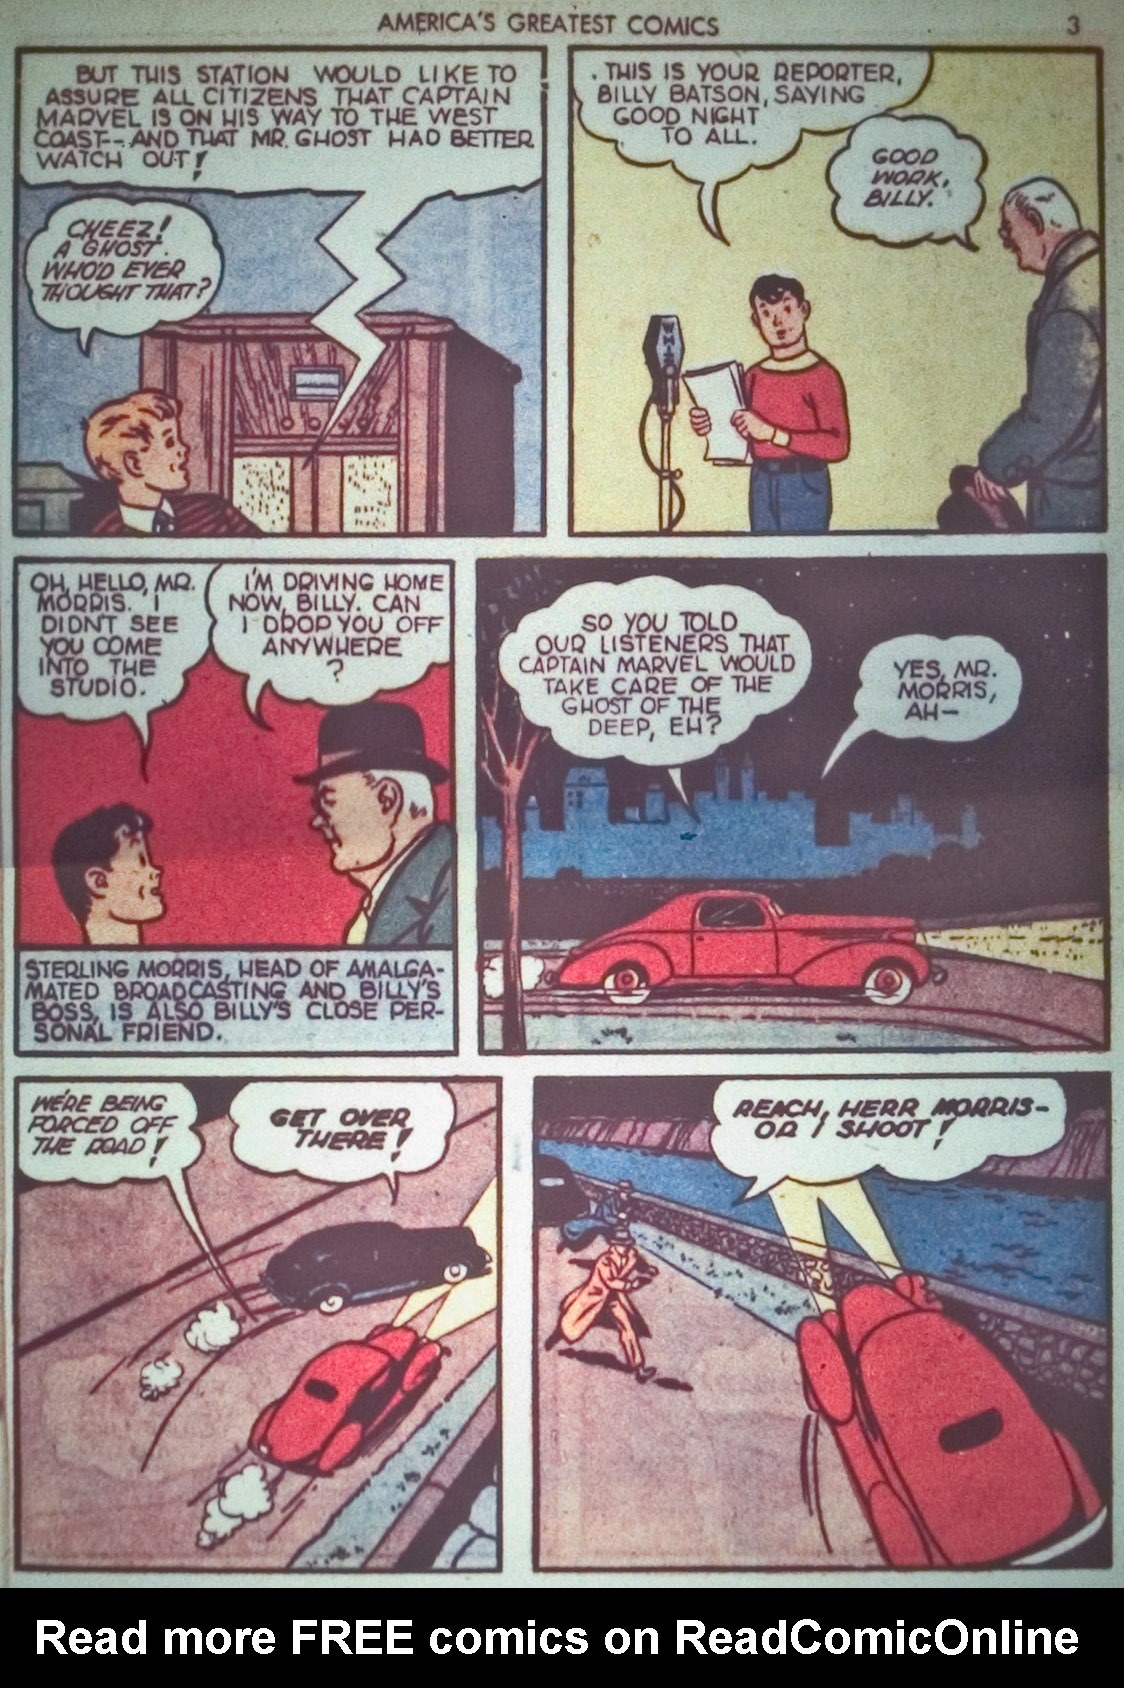 Read online America's Greatest Comics comic -  Issue #1 - 6